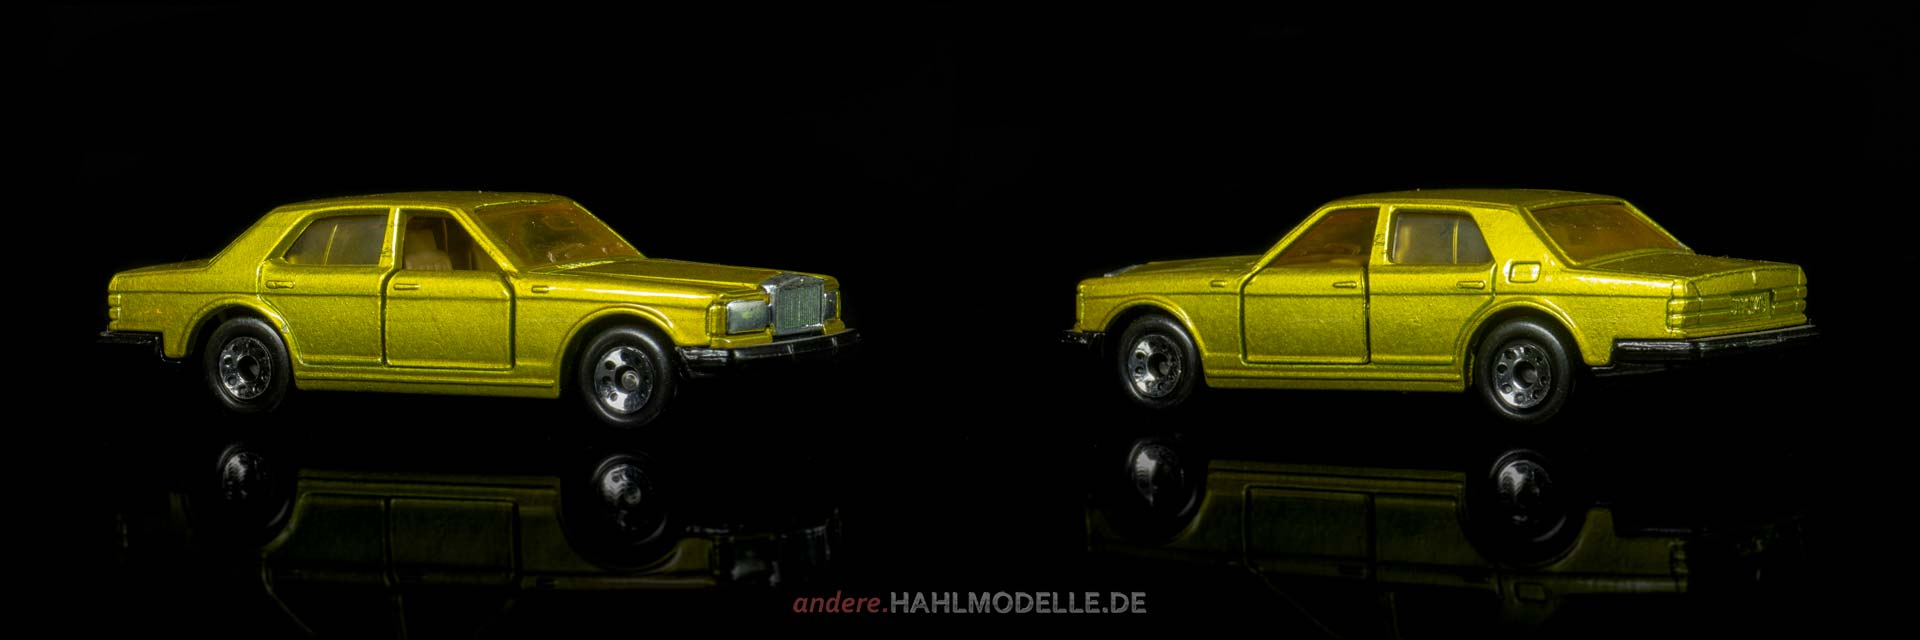 Rolls-Royce Silver Spirit | Limousine | Matchbox Toys Ltd. | 1:69 | www.andere.hahlmodelle.de